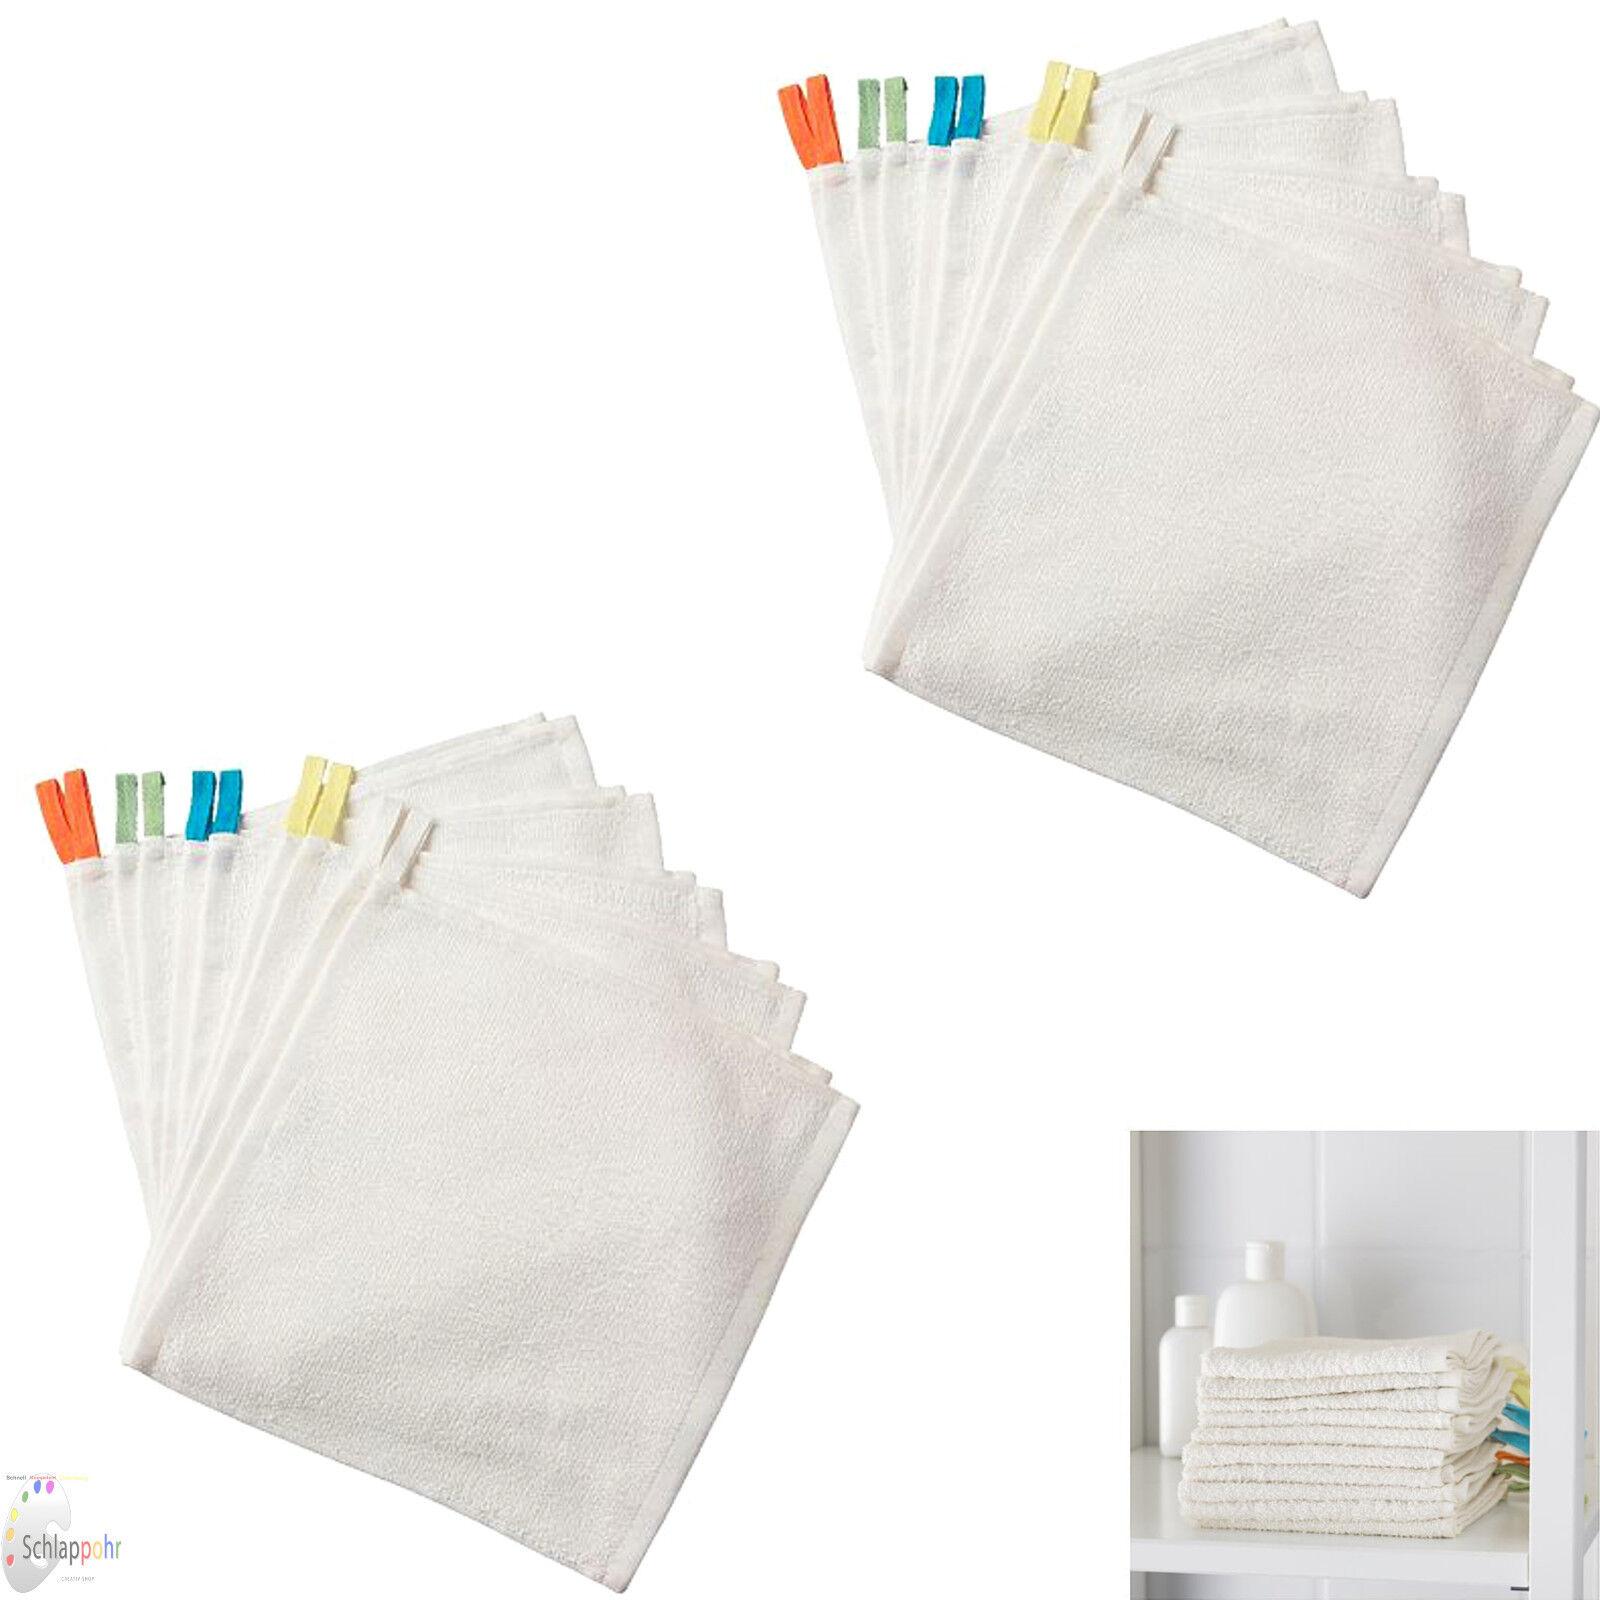 IKEA KRAMA 20 Stück Set Baby-Waschlappen Abschminken 100% Baumwolle NEU & OVP